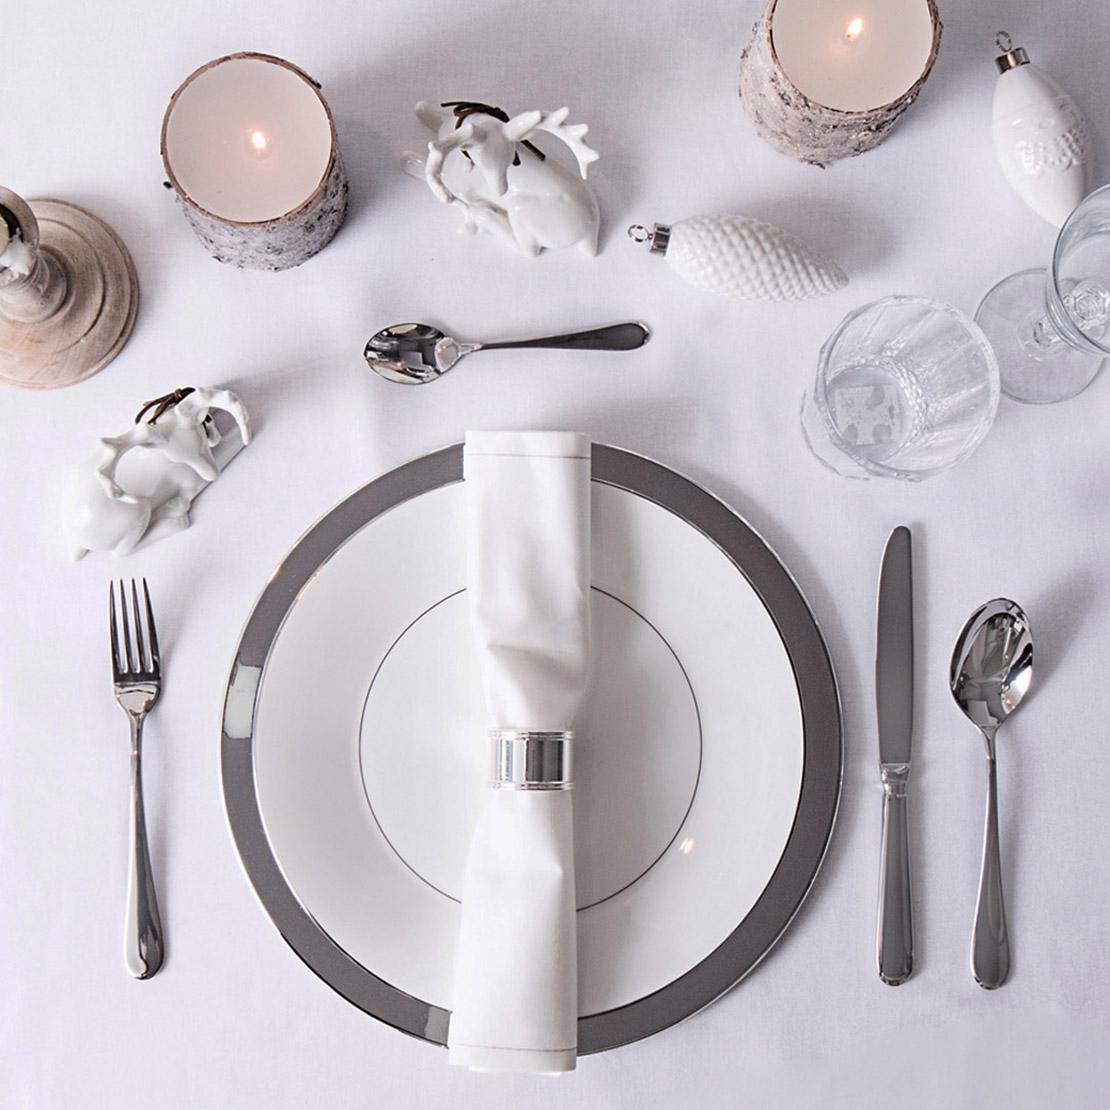 Decoración de mesas para fiestas en plata